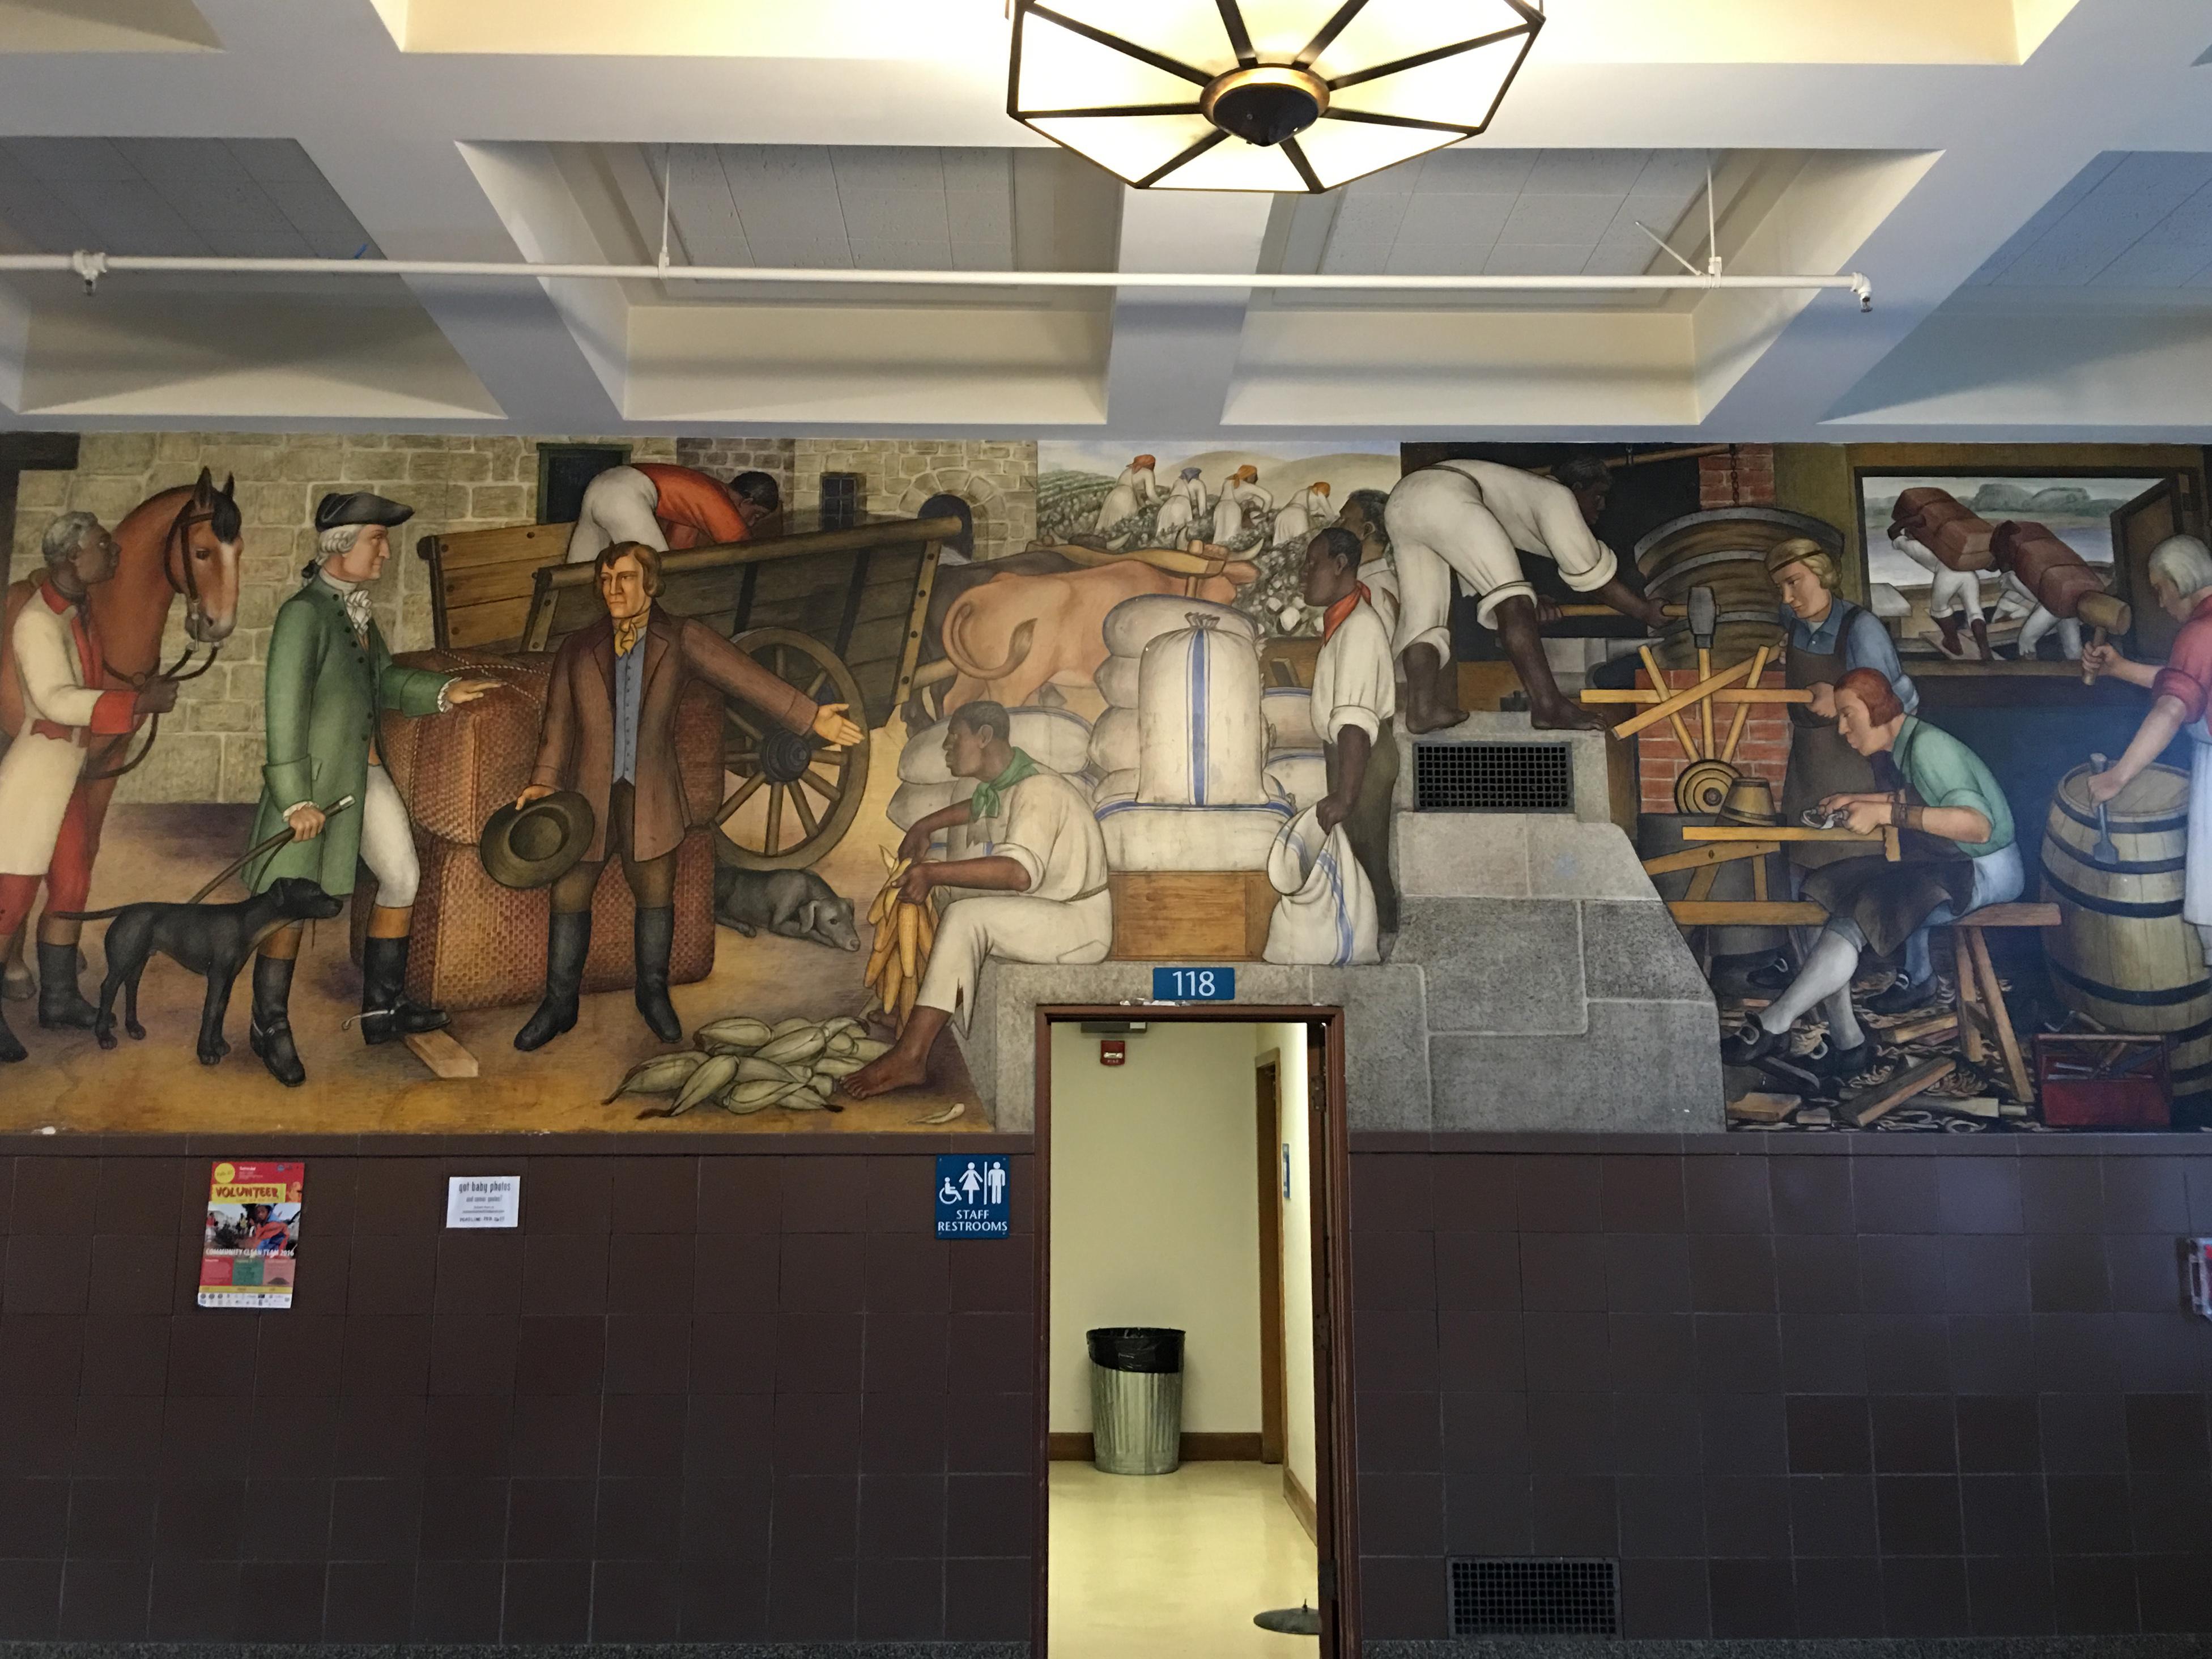 Victor Arnautoff Life of Washington buon fresco murals: Washington at Mount Vernon with the laborers of a plantation: enslaved African-Americans as well as Caucasian tradesmen. Credit: Tammy Aramian/GWHS Alumni Association.